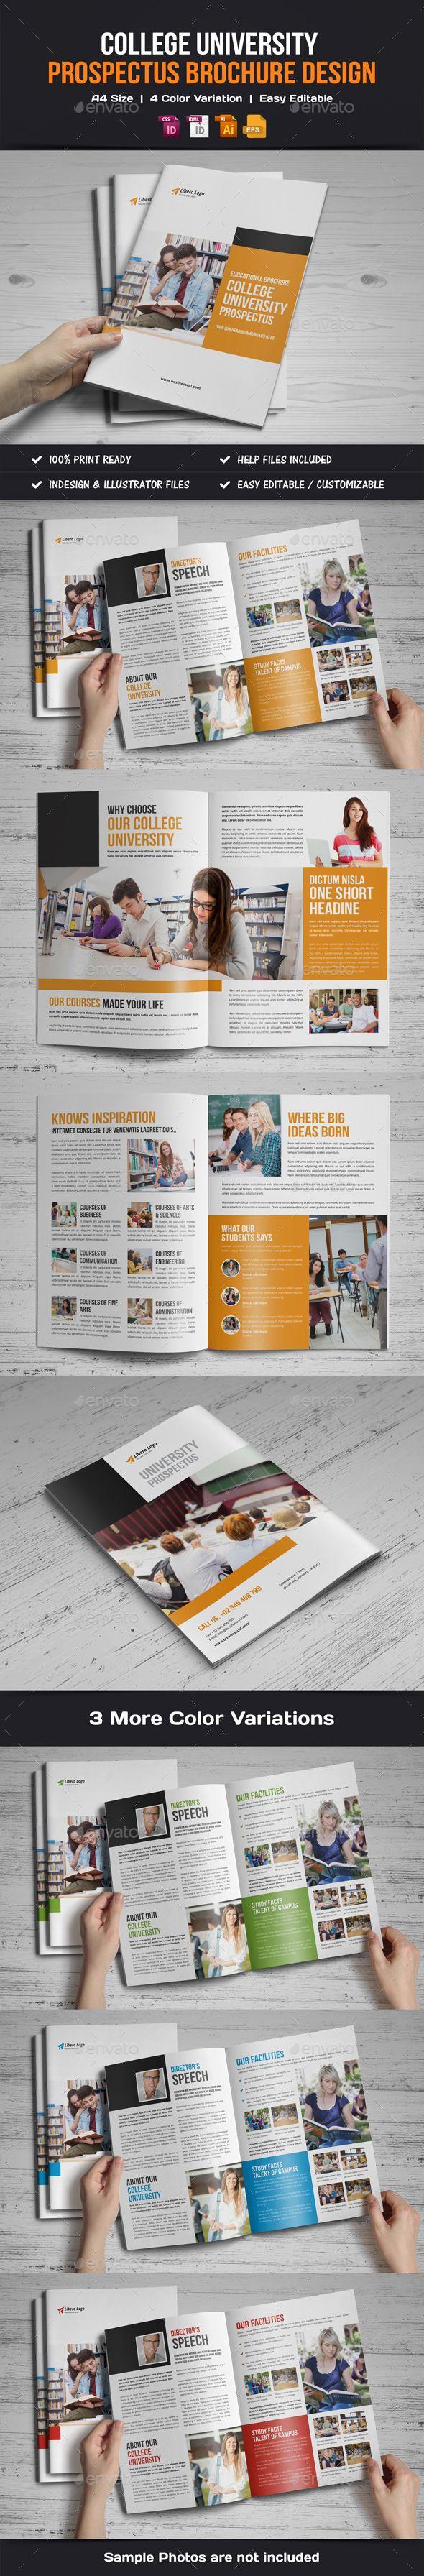 college university prospectus brochure v1 pinterest ai